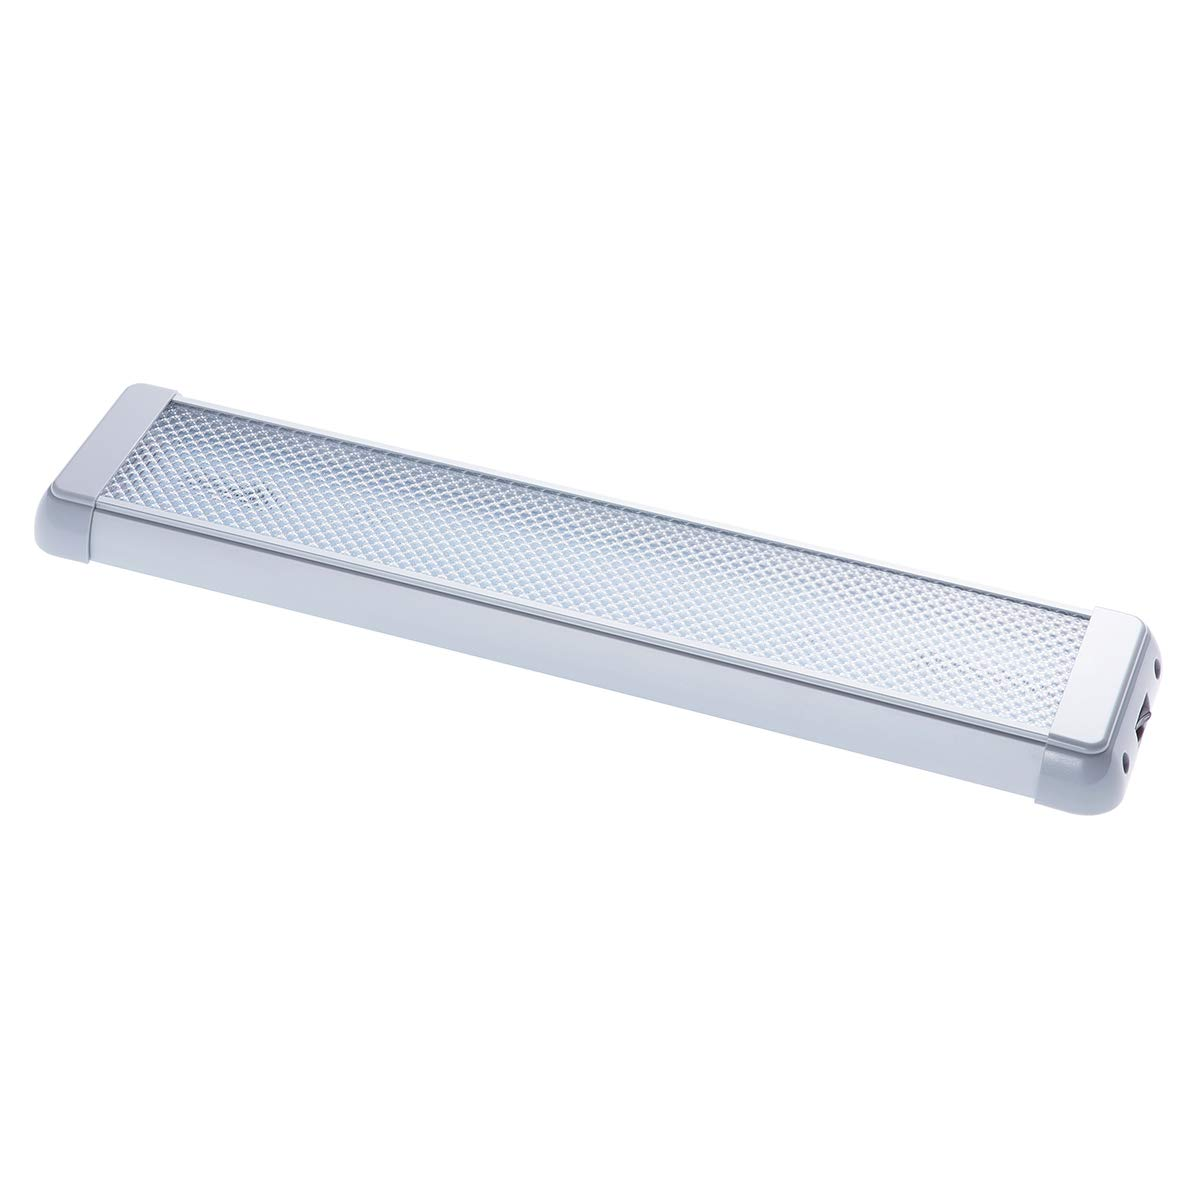 1 Pack Raycharm 14.2 Inch 12-24V 12.4W 1240 Lumen 6000K LED Light Fixture in Grey for RV